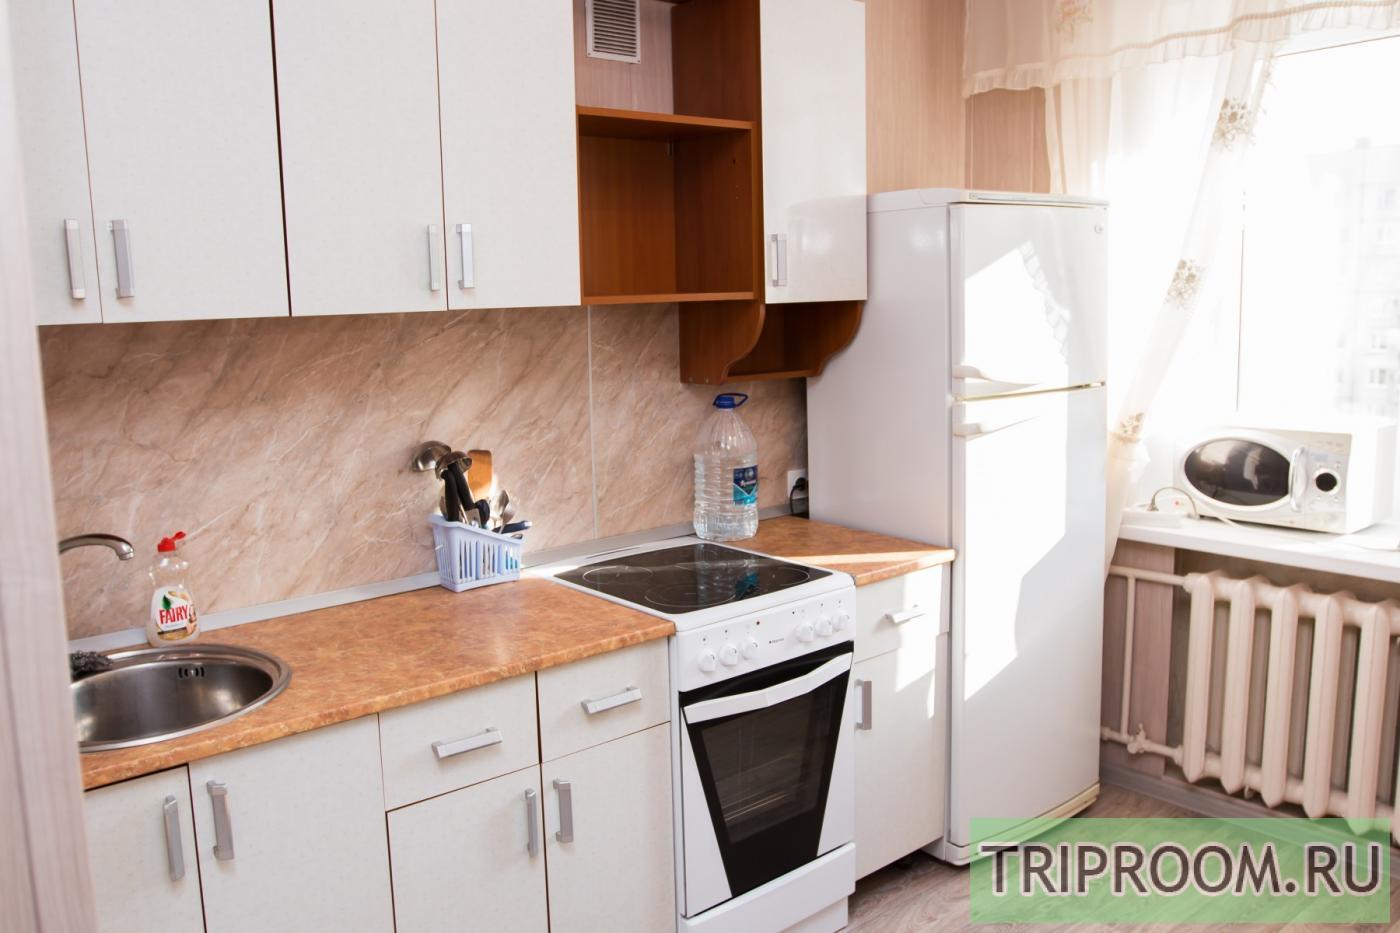 1-комнатная квартира посуточно (вариант № 19637), ул. Ульяновский пр-кт, фото № 2